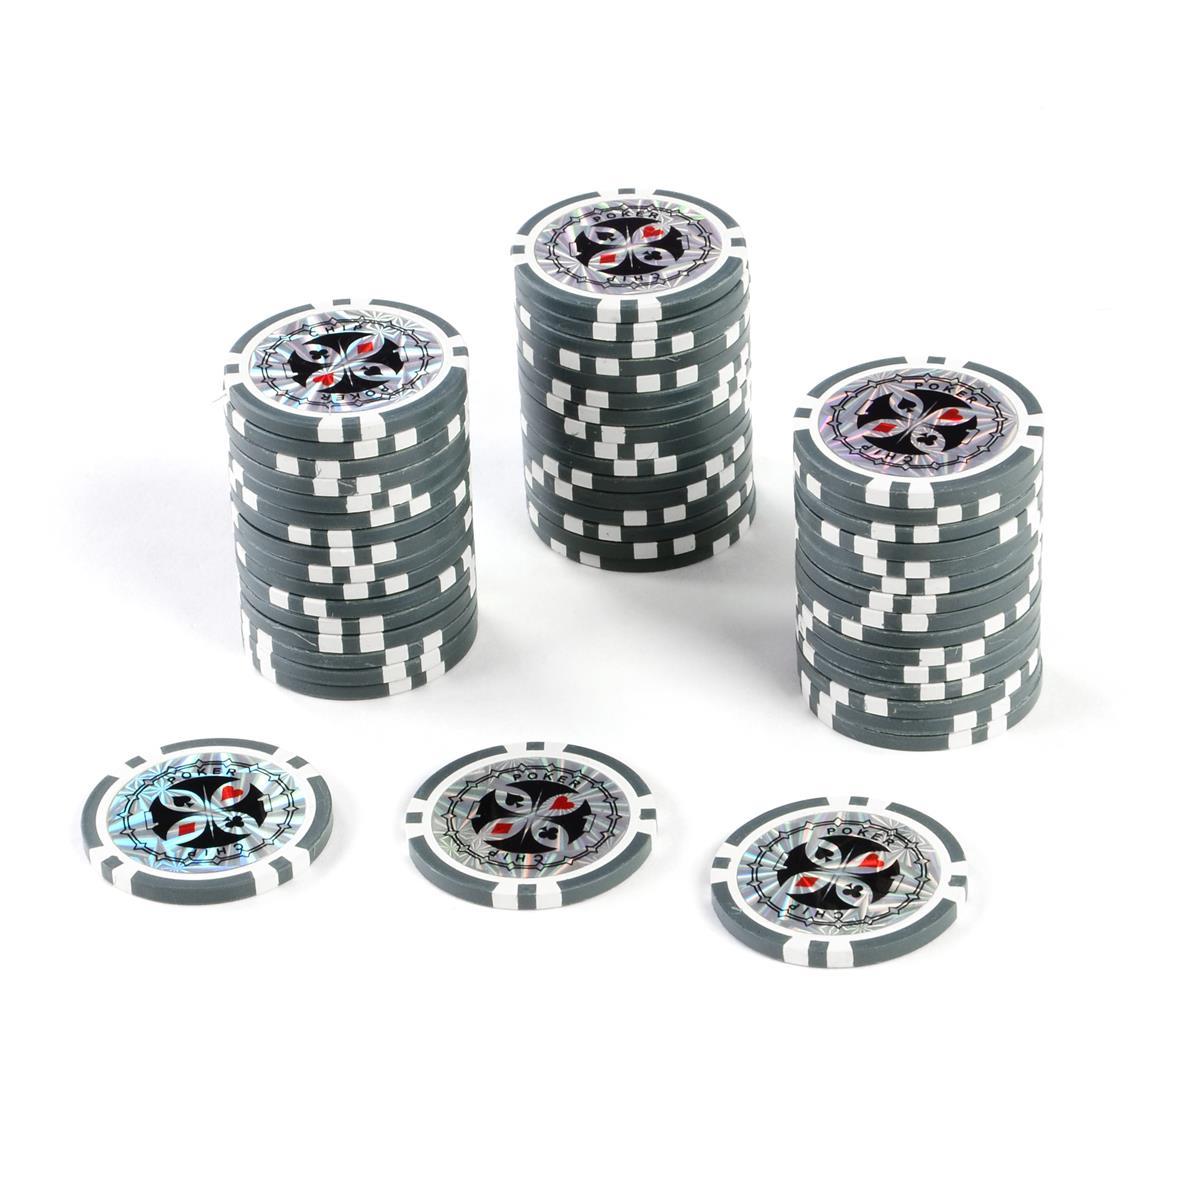 50 Poker-Chips Wert 1 Laserchip 12g Metallkern ergänzend zum Pokerkoffer